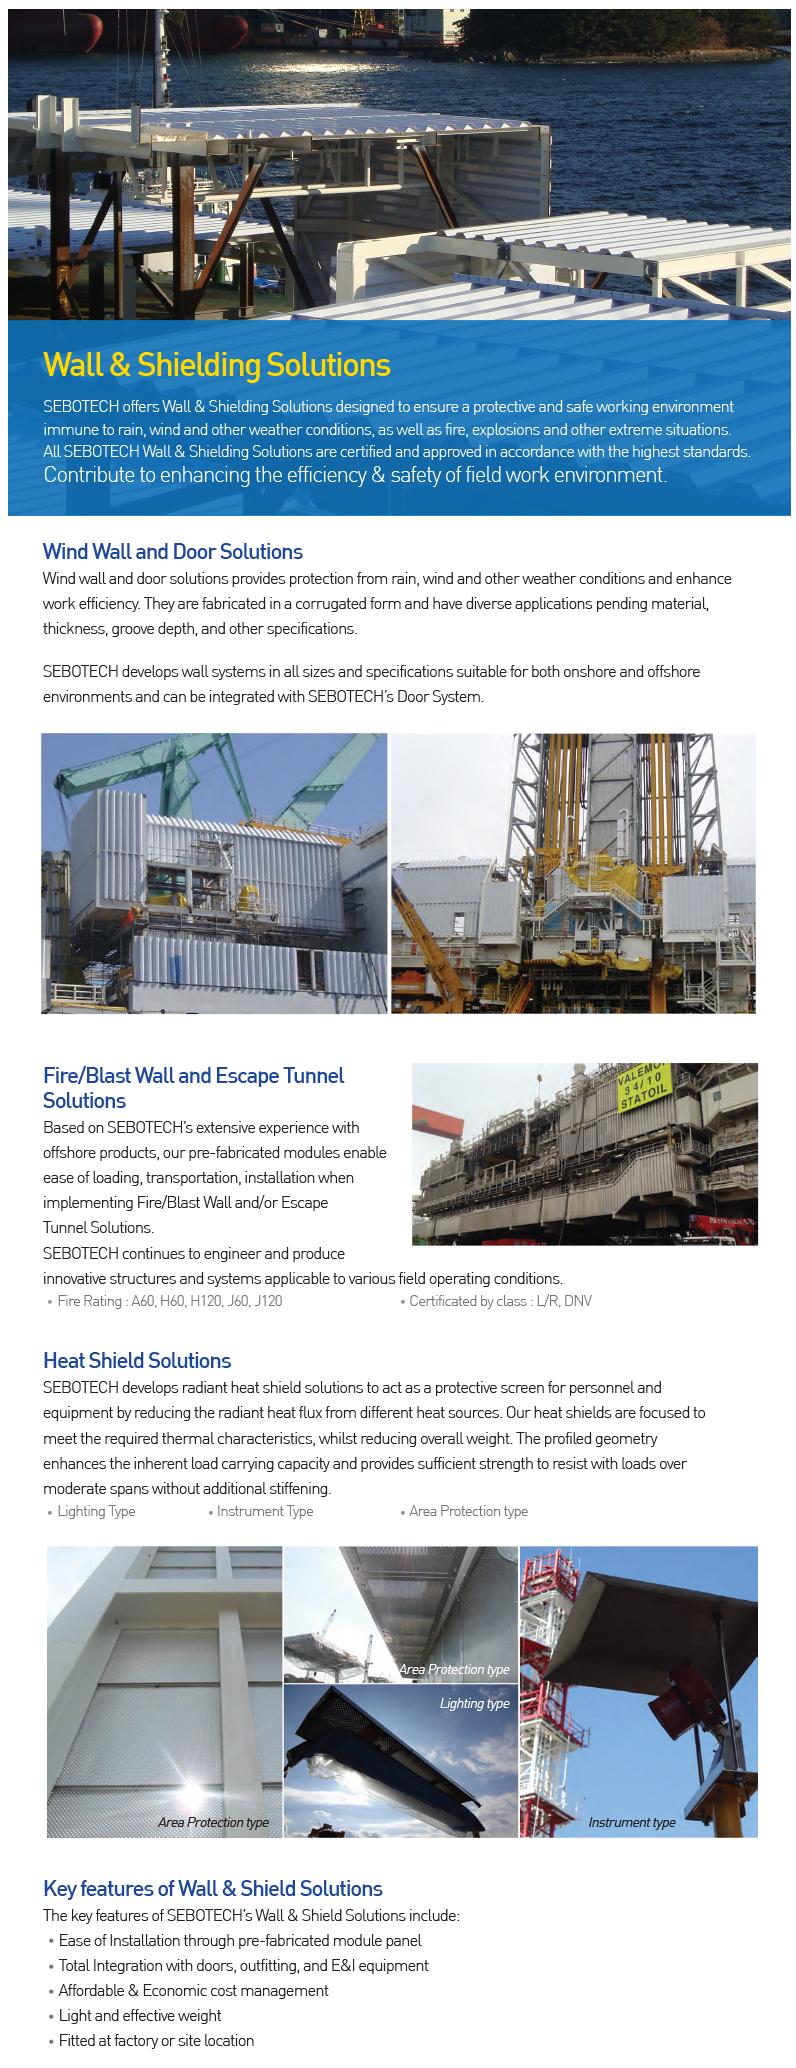 SEBOTECH Wall & Shielding Solutions